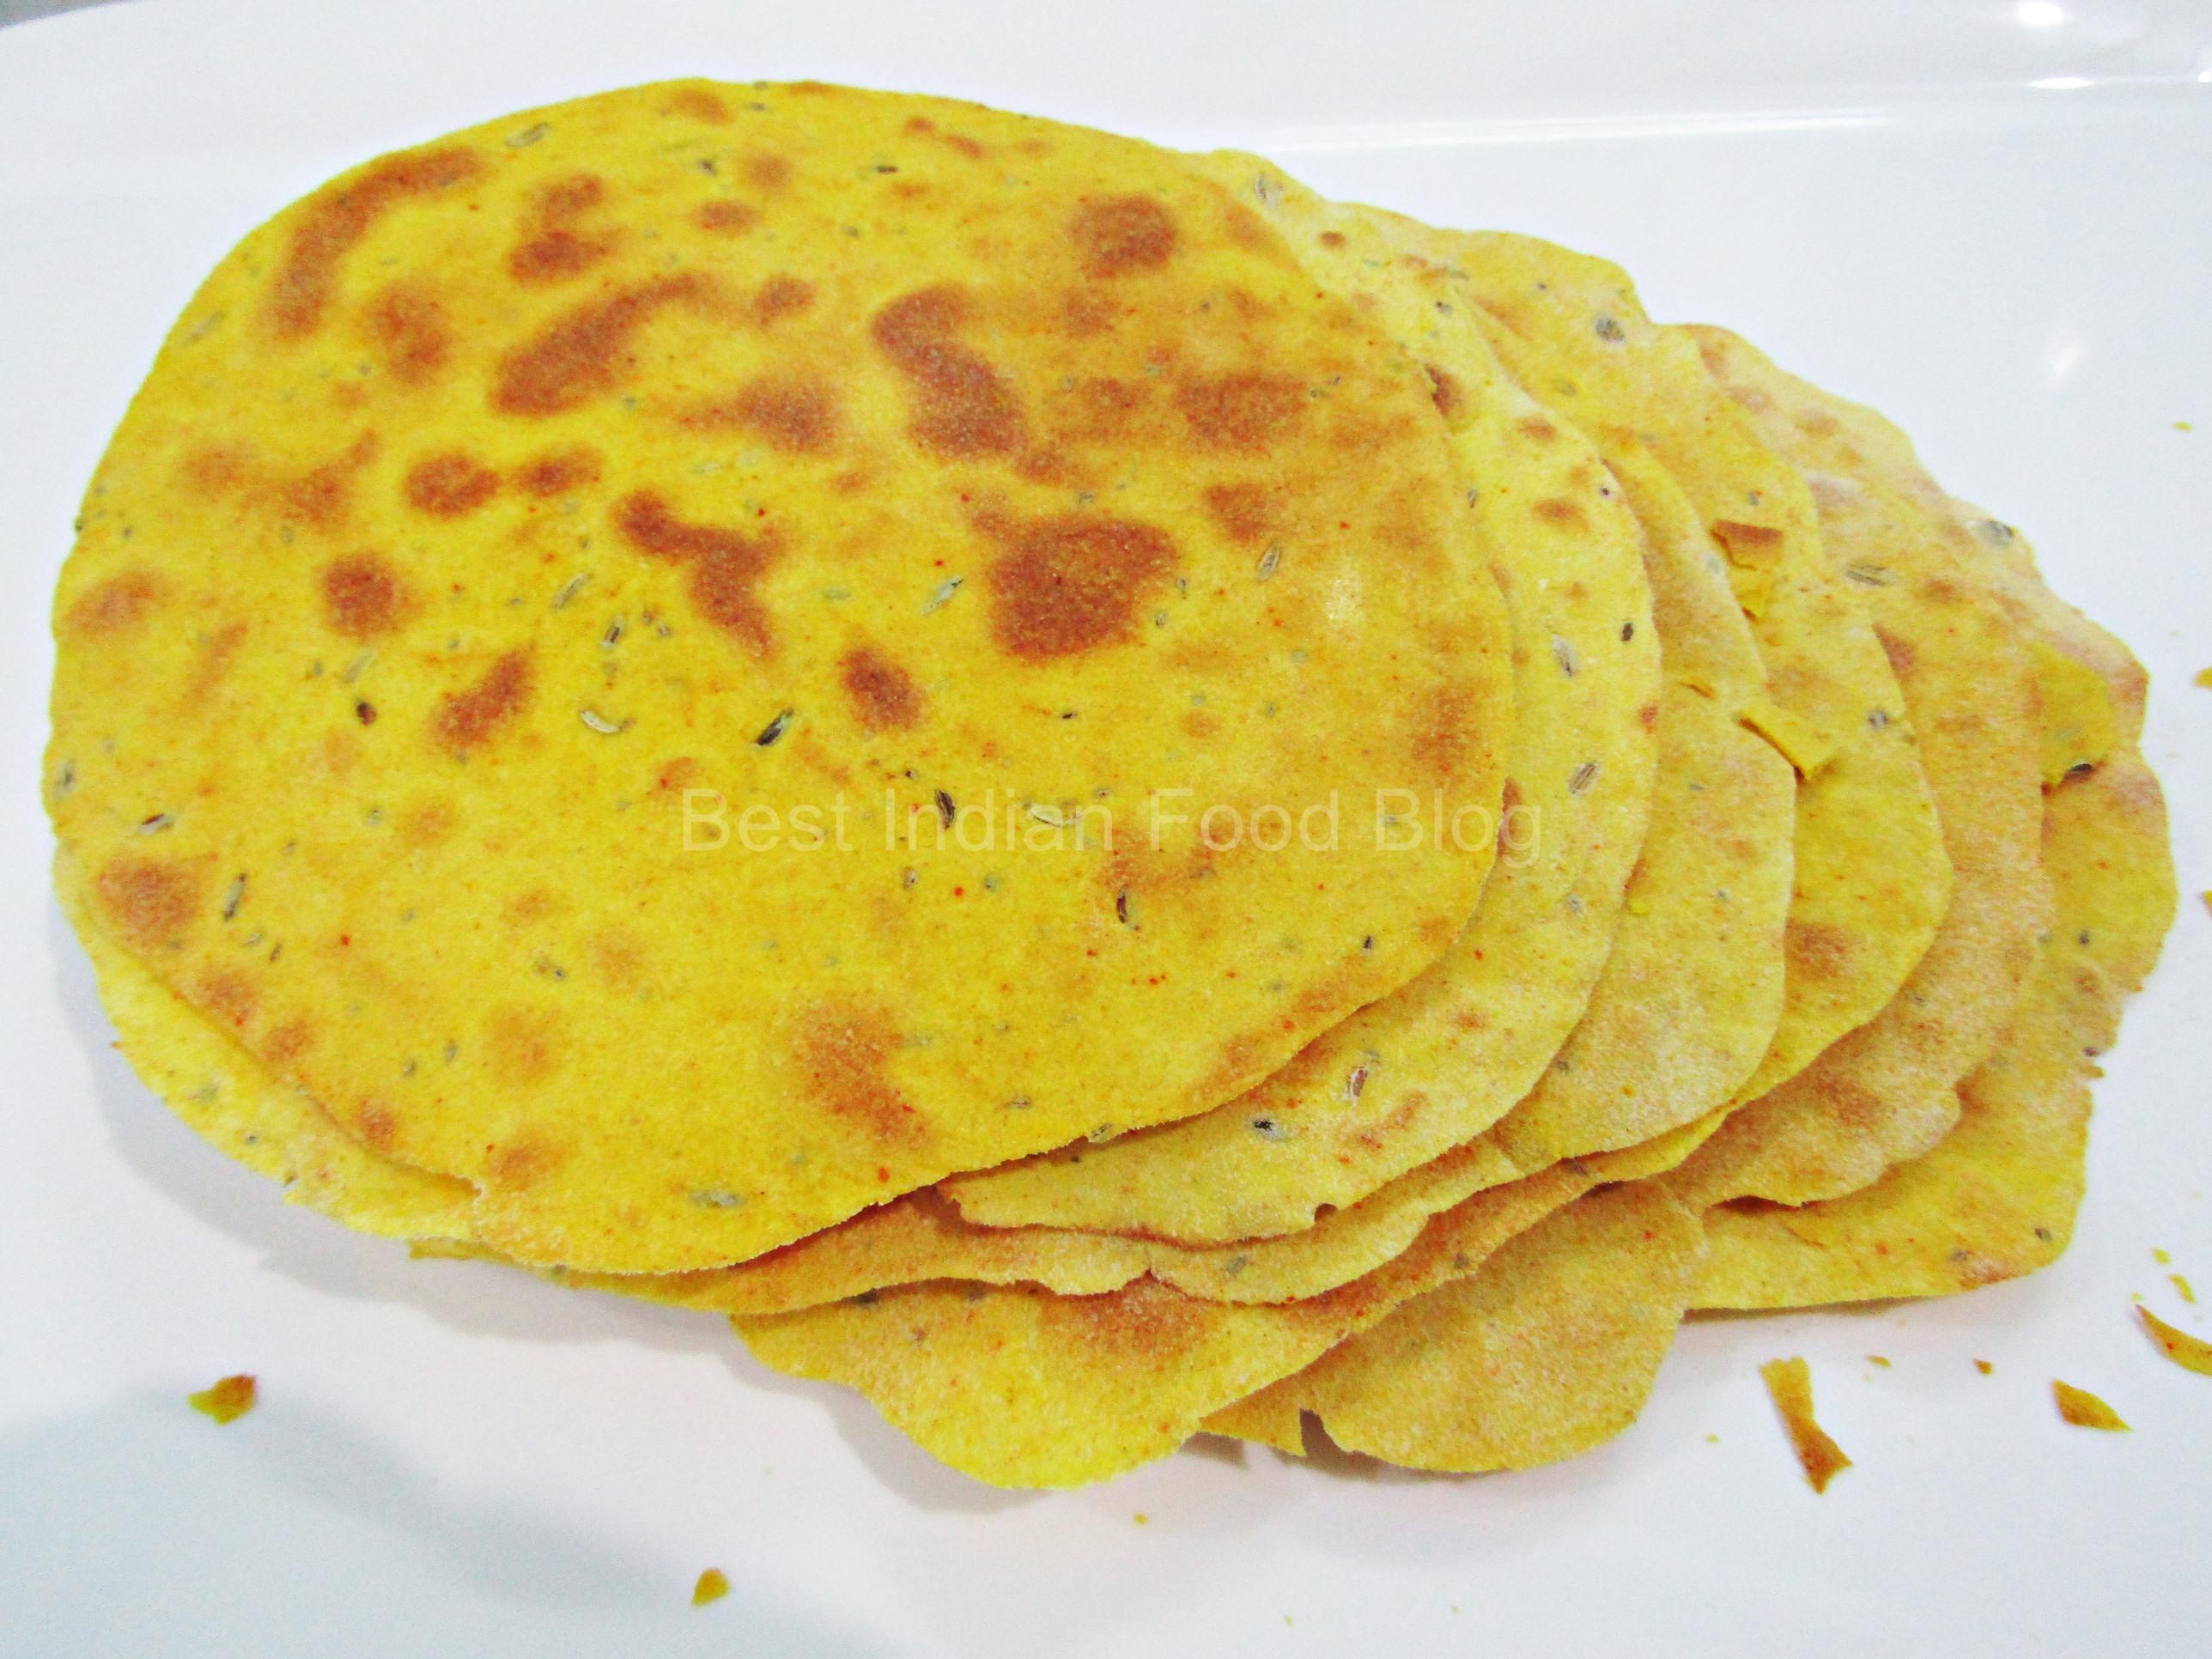 Khakhra from Dadra Nagar Haveli Daman Diu, India | Best Indian Food Blog | Wheat recipe